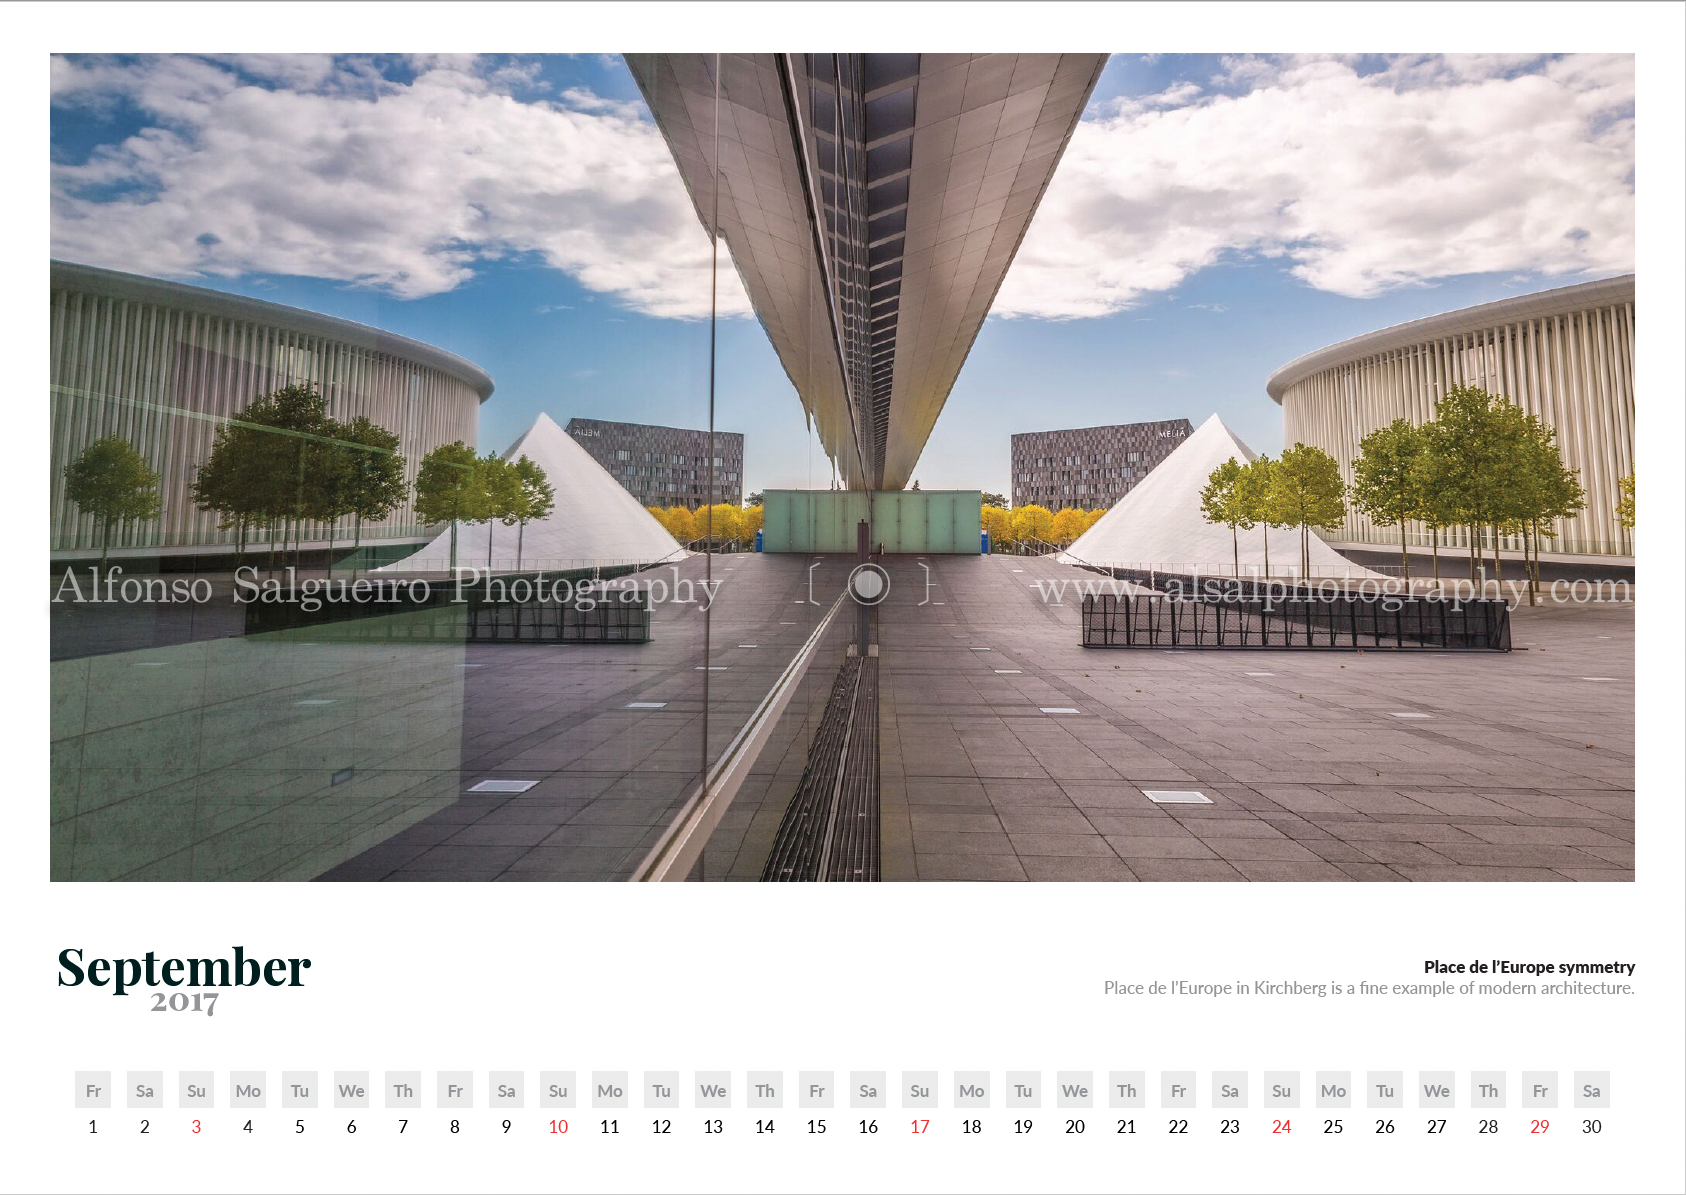 Luxembourg 2017 calendar-10.jpg